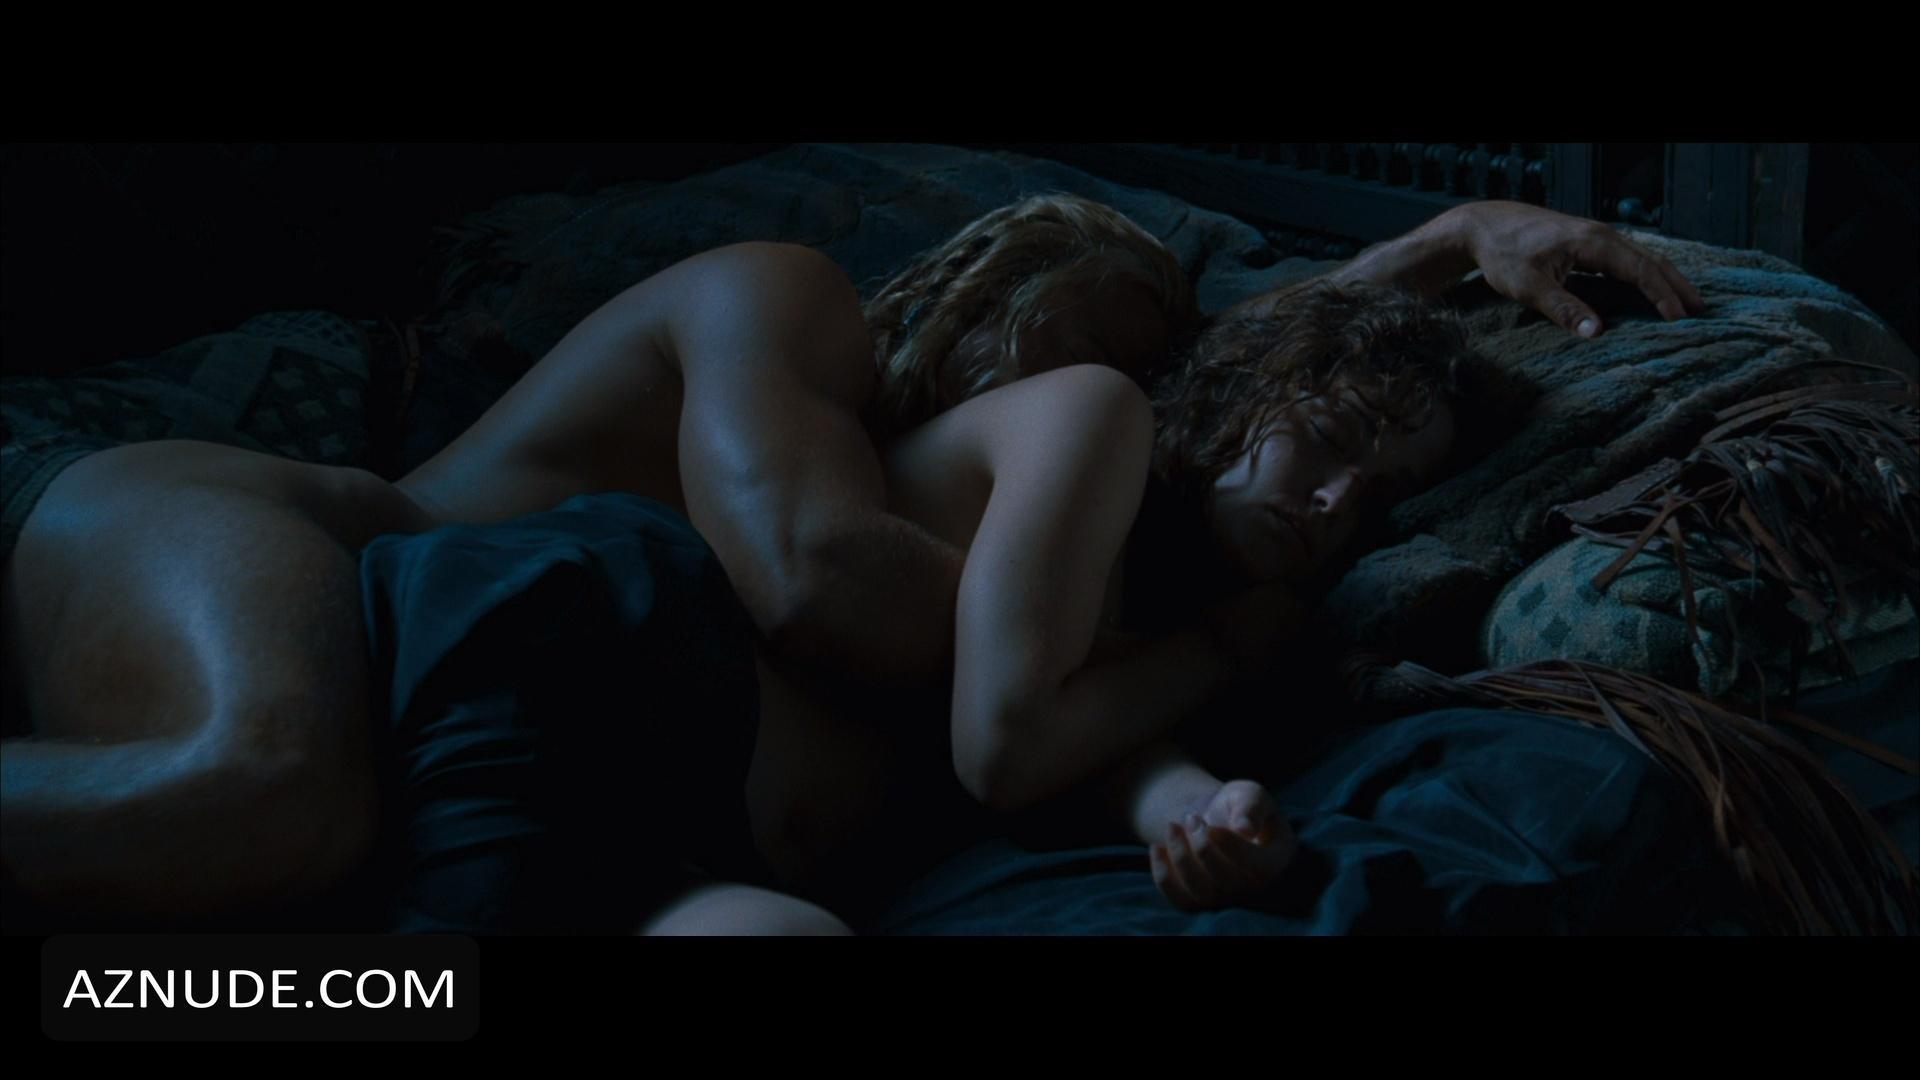 Magnificent Brad pitt sex scenes think, that